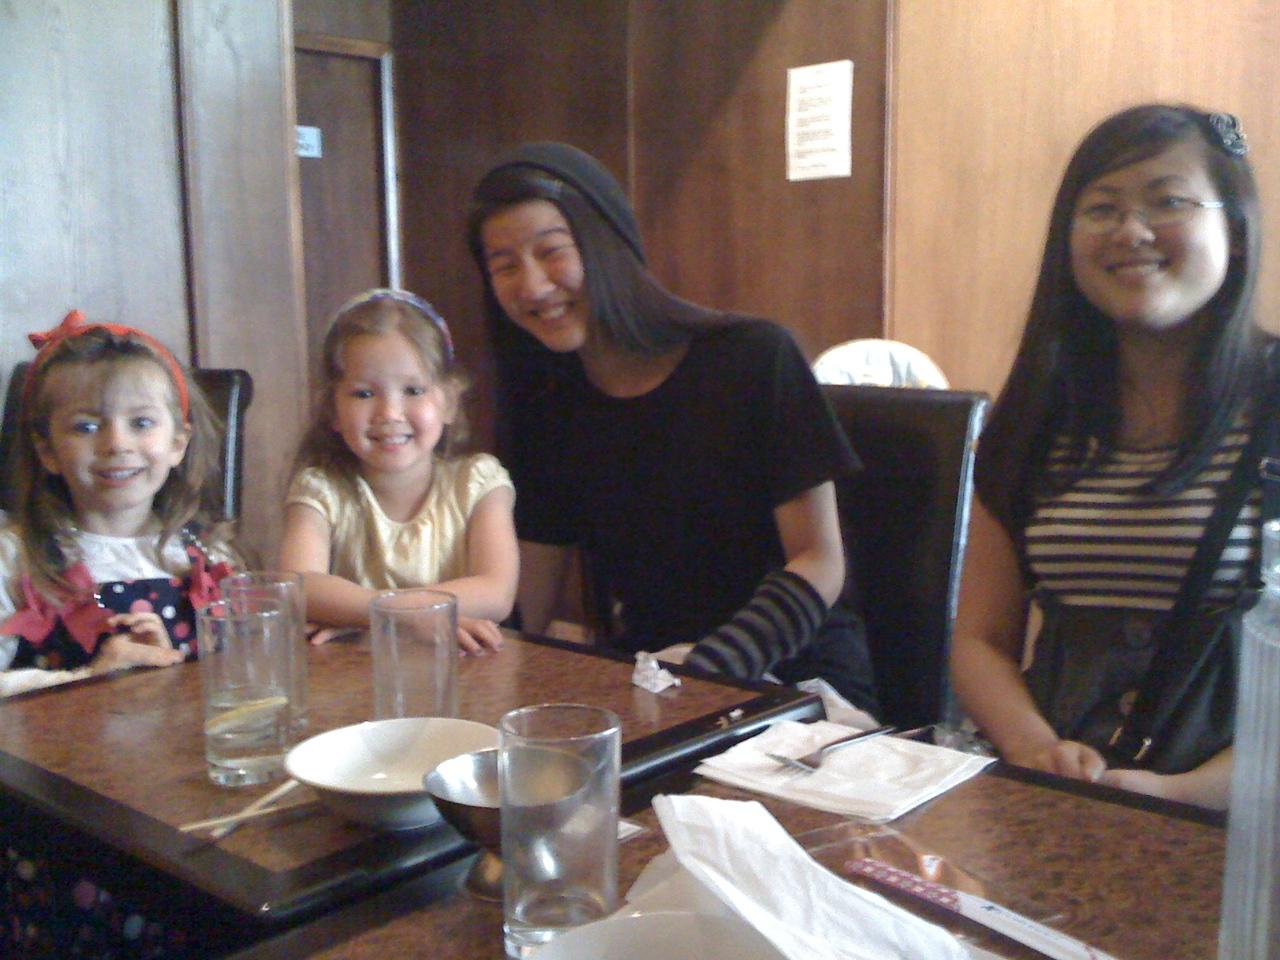 Sam, Cerys, Rhiannon and Celyn at Celyn's birthday lunch